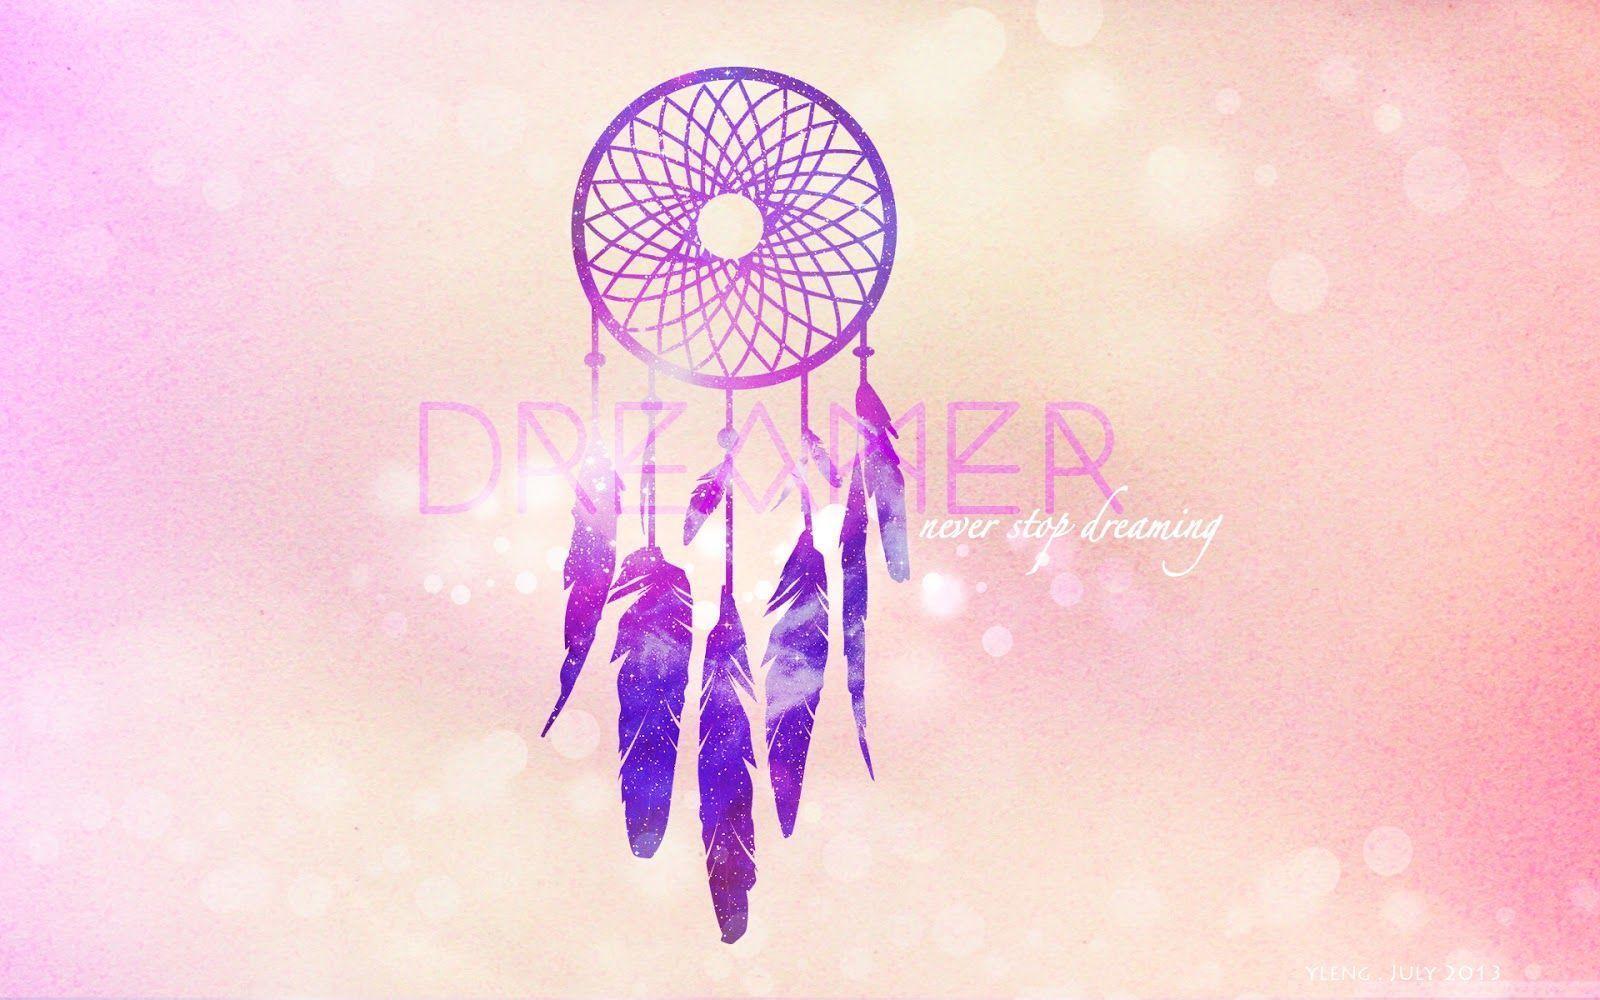 Wallpapers For > Dreamcatcher Wallpaper